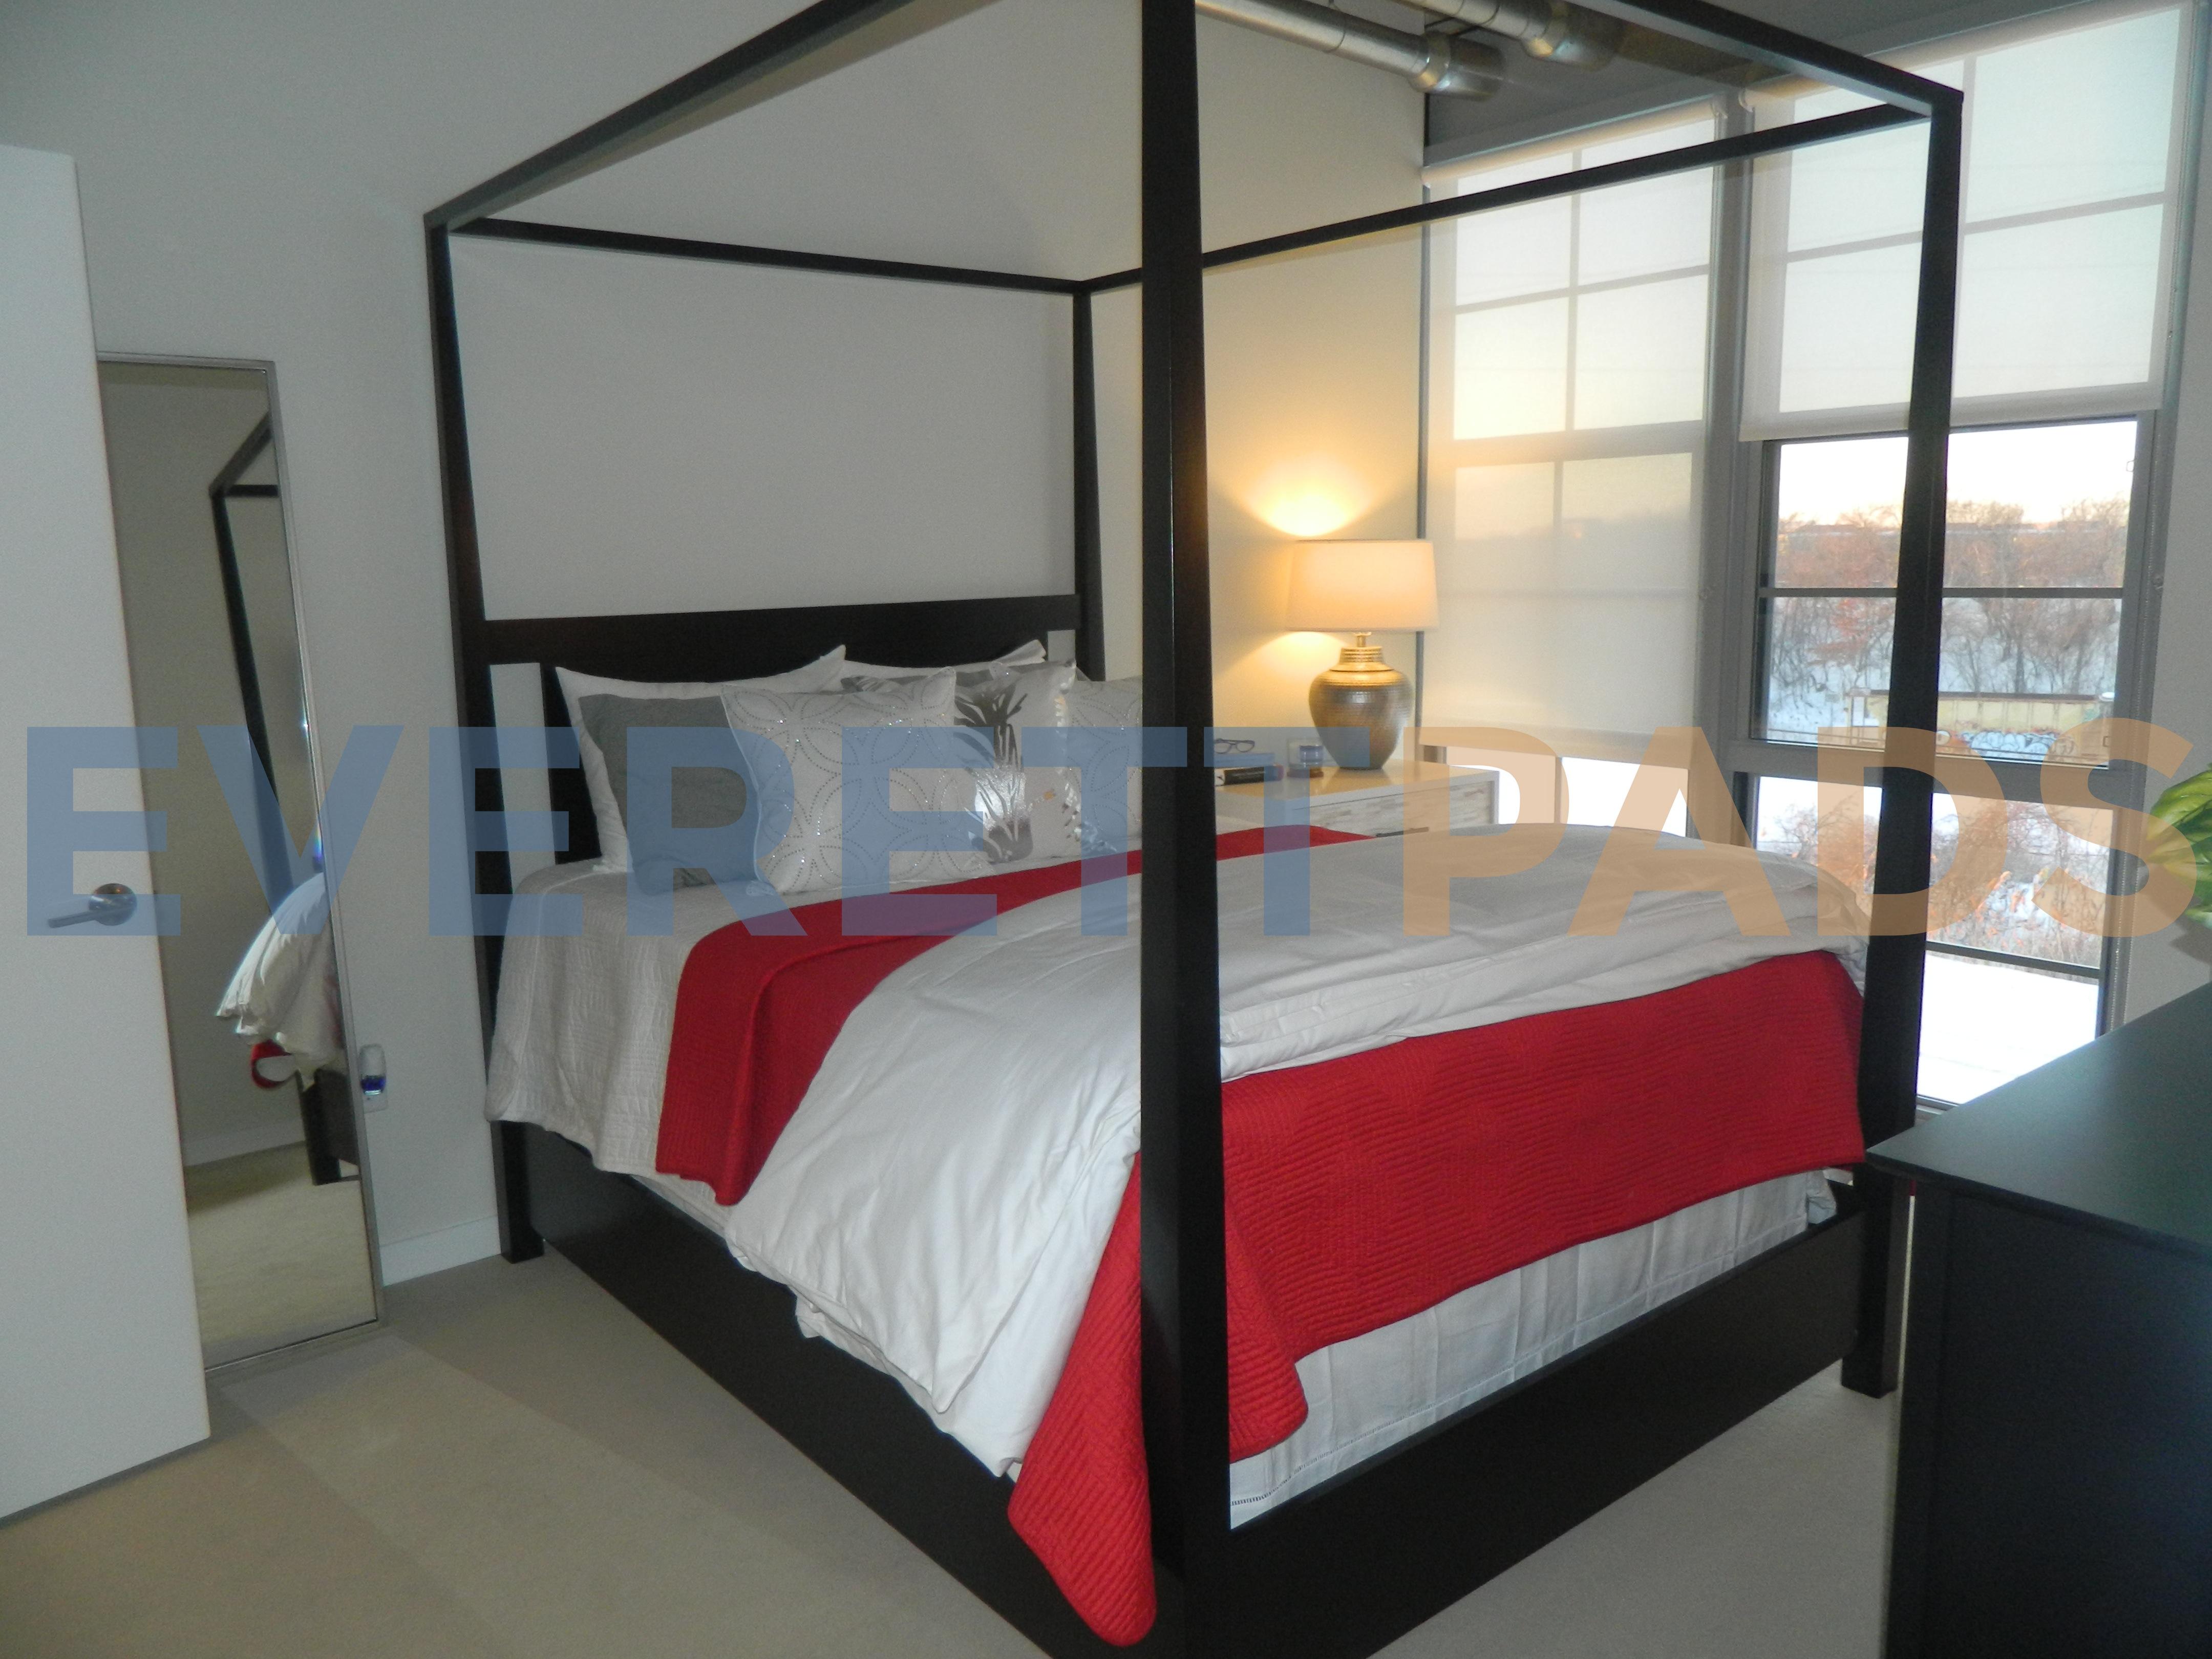 The Batch Yard bedroom